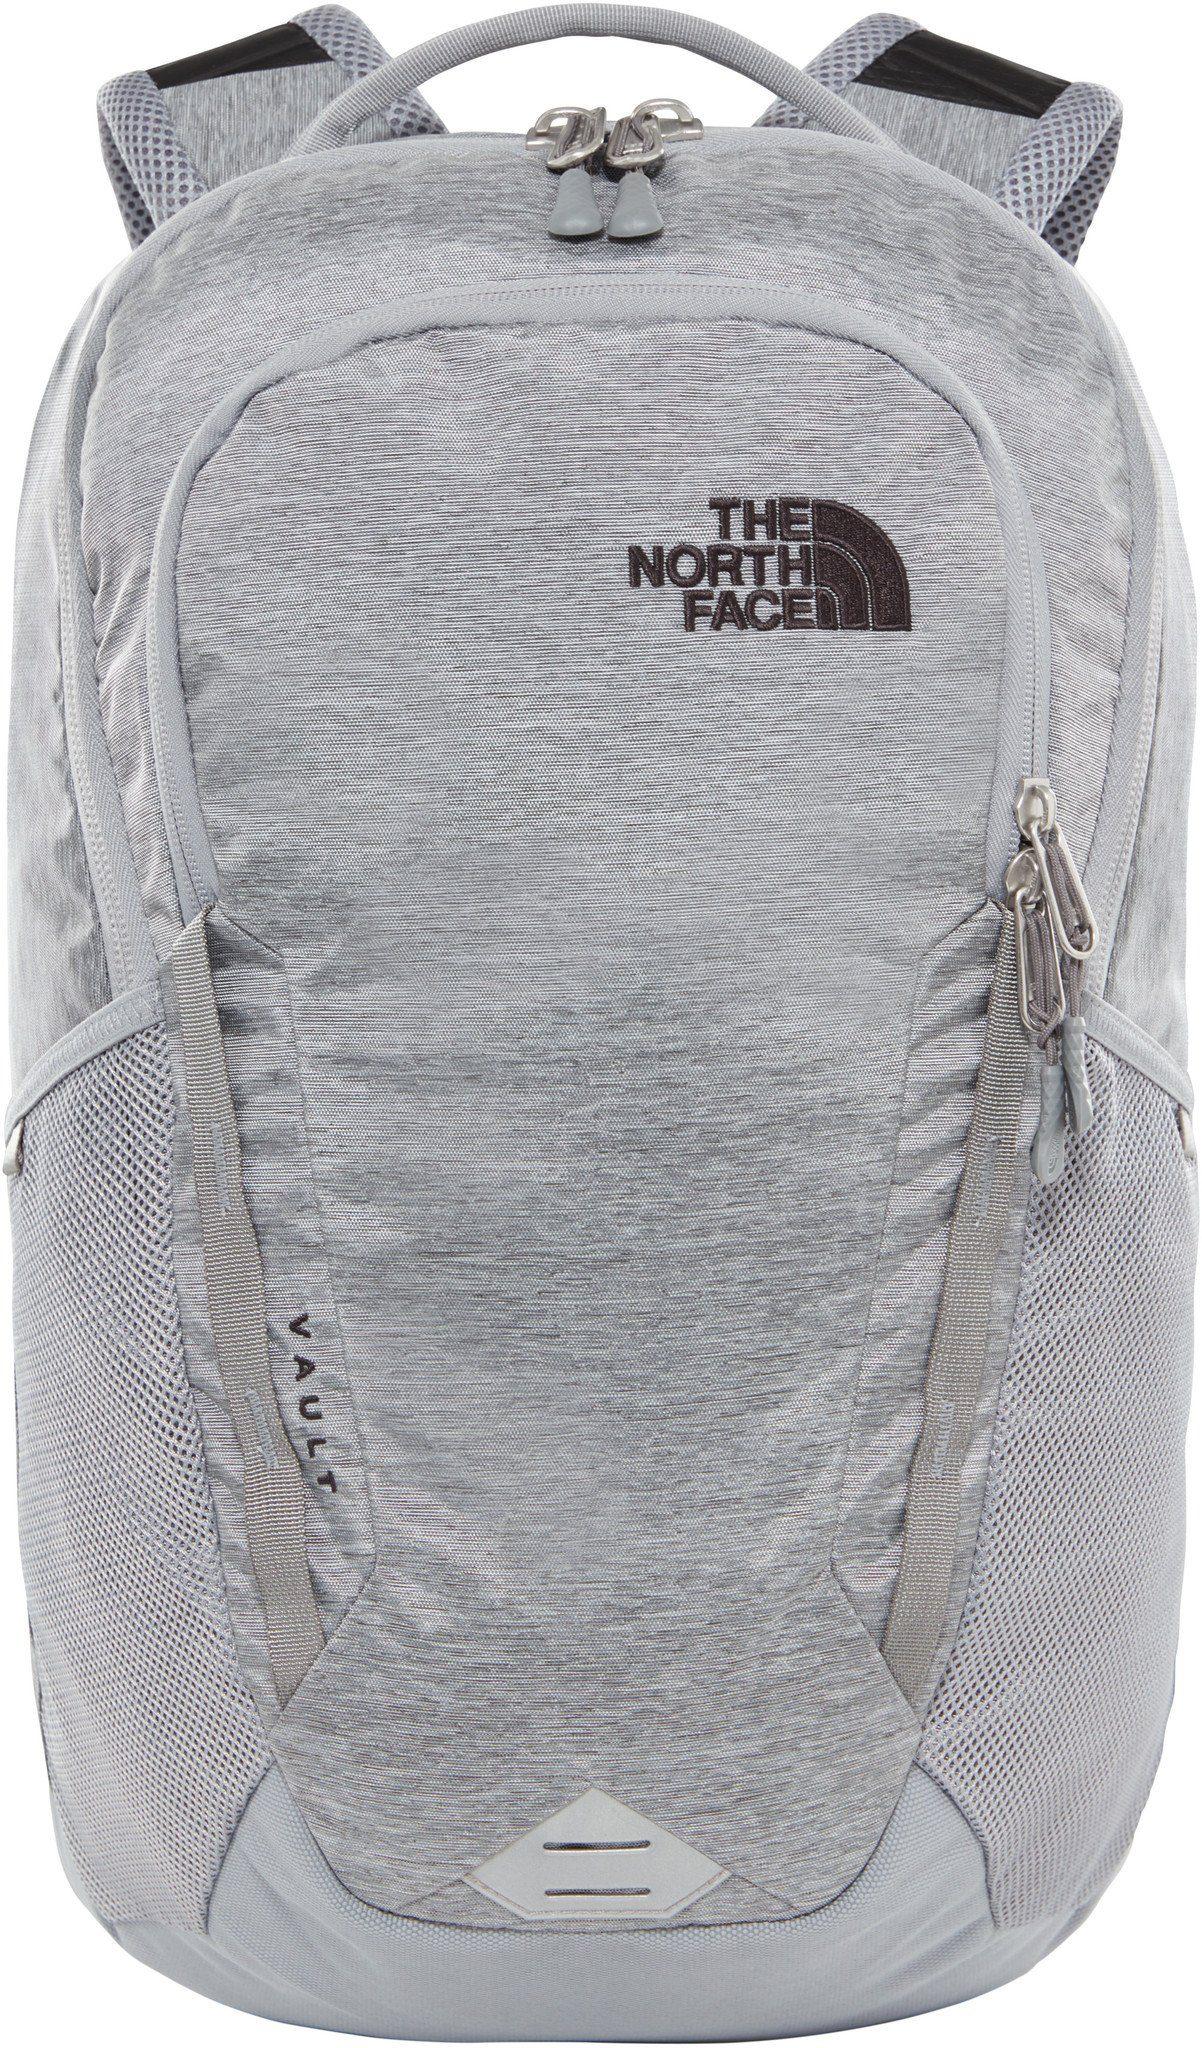 The North Face Wanderrucksack »Vault Backpack«